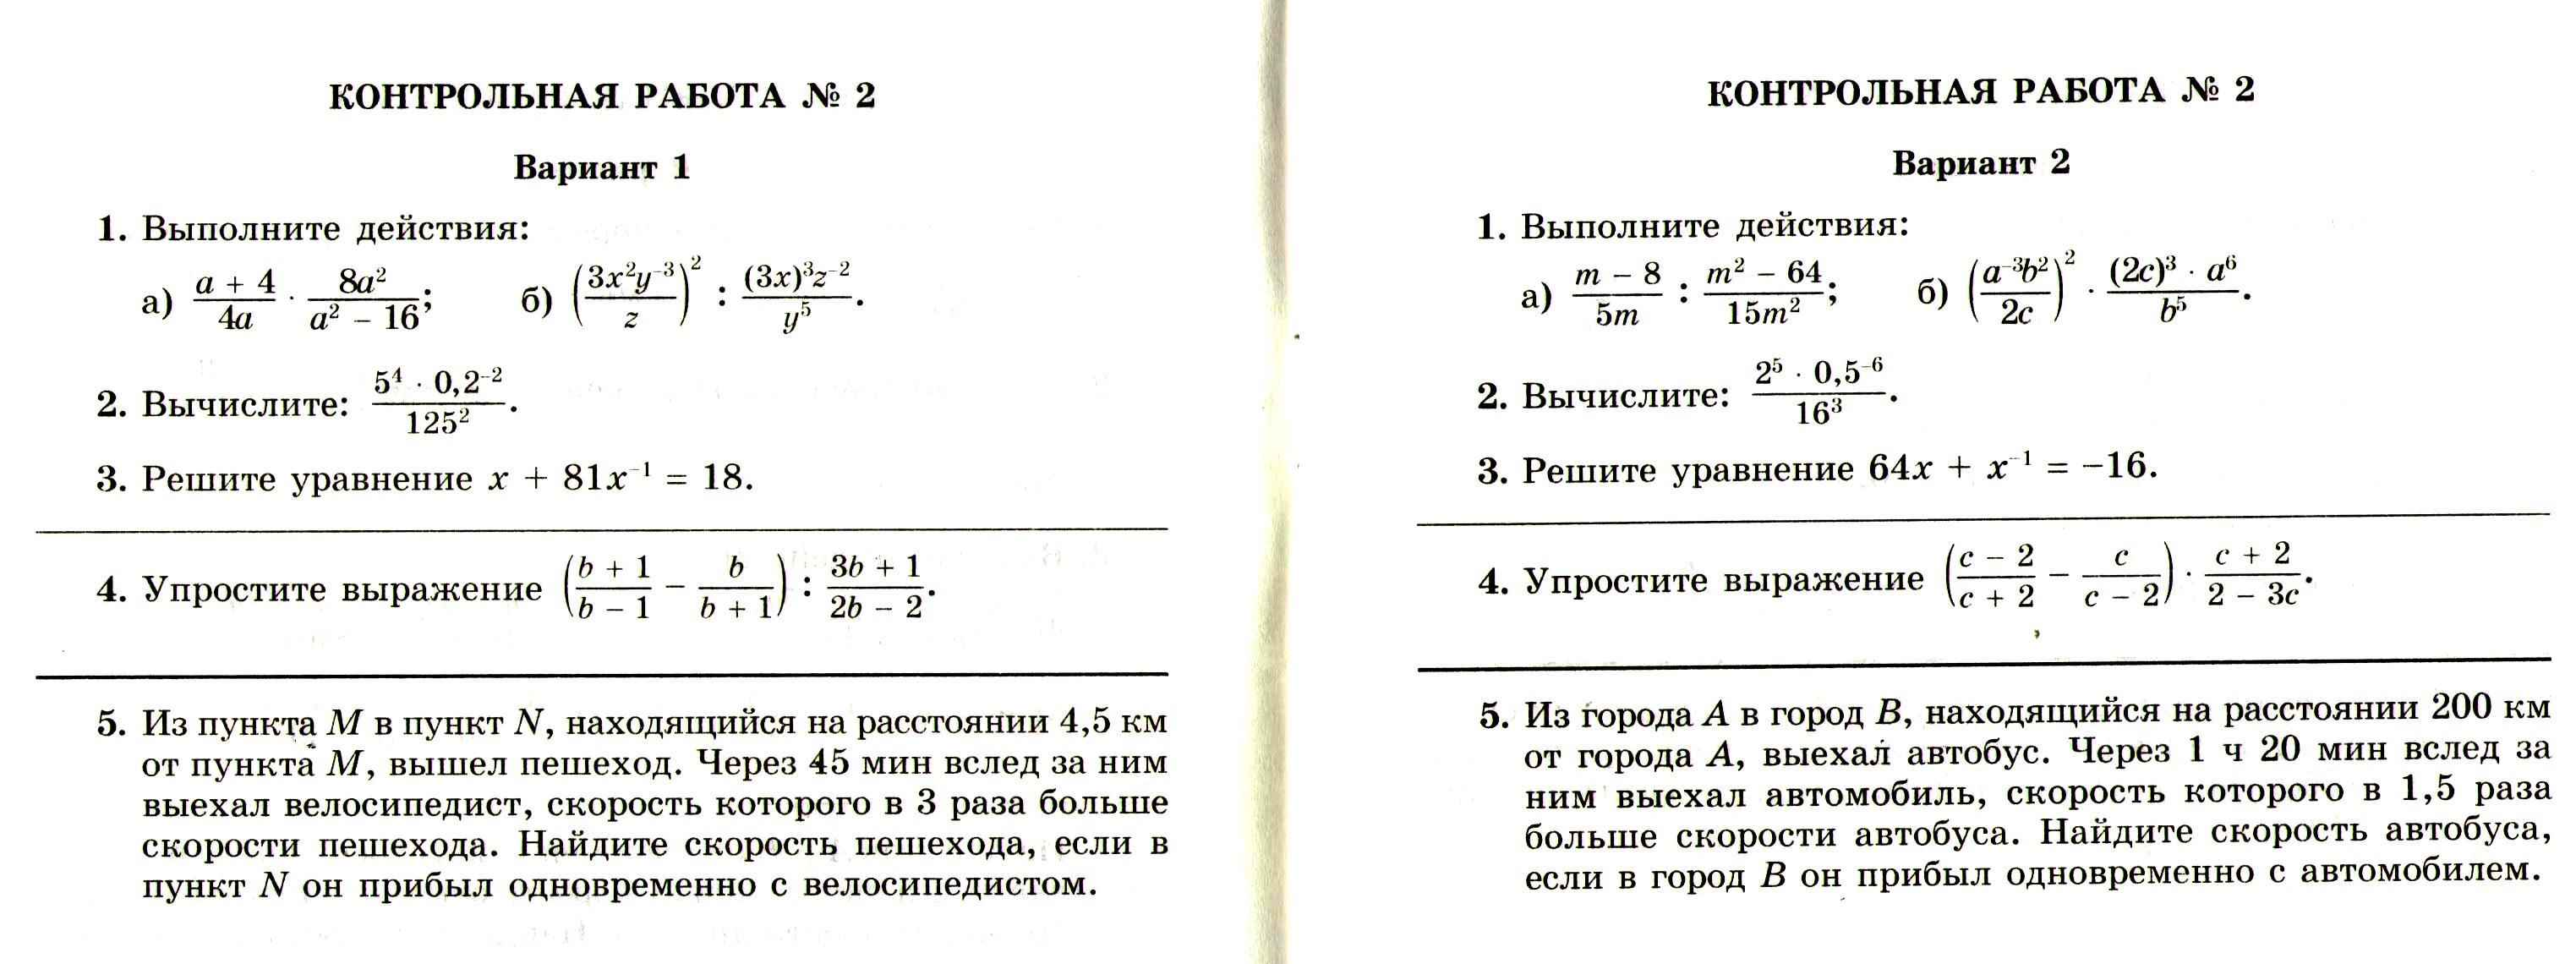 C:\Users\Айдар\Desktop\регине14-15г.г\кимы6,7,8,9\контр.раб 8 класс\кр2.jpeg